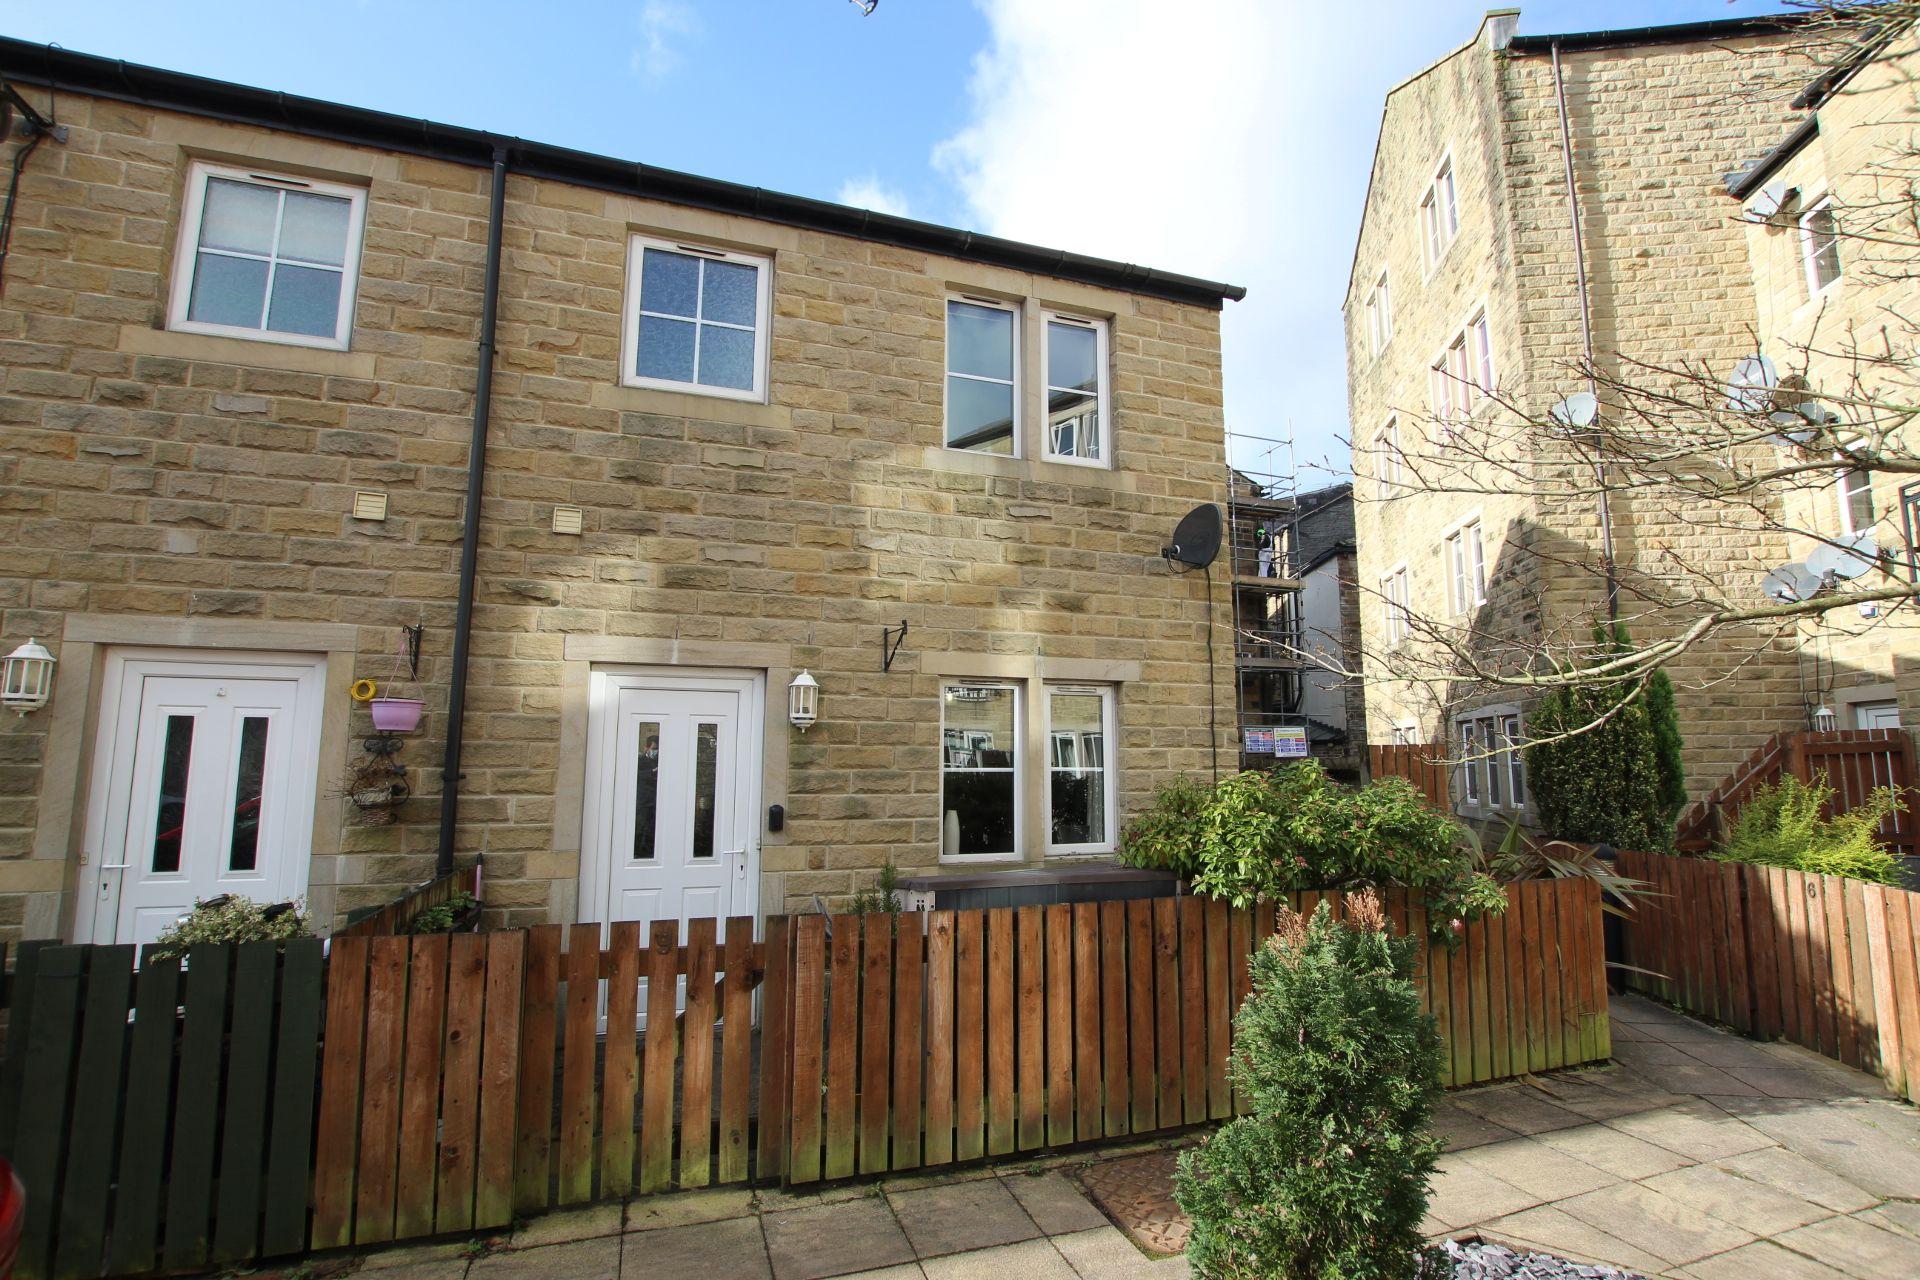 Property photo 1 of 9. External